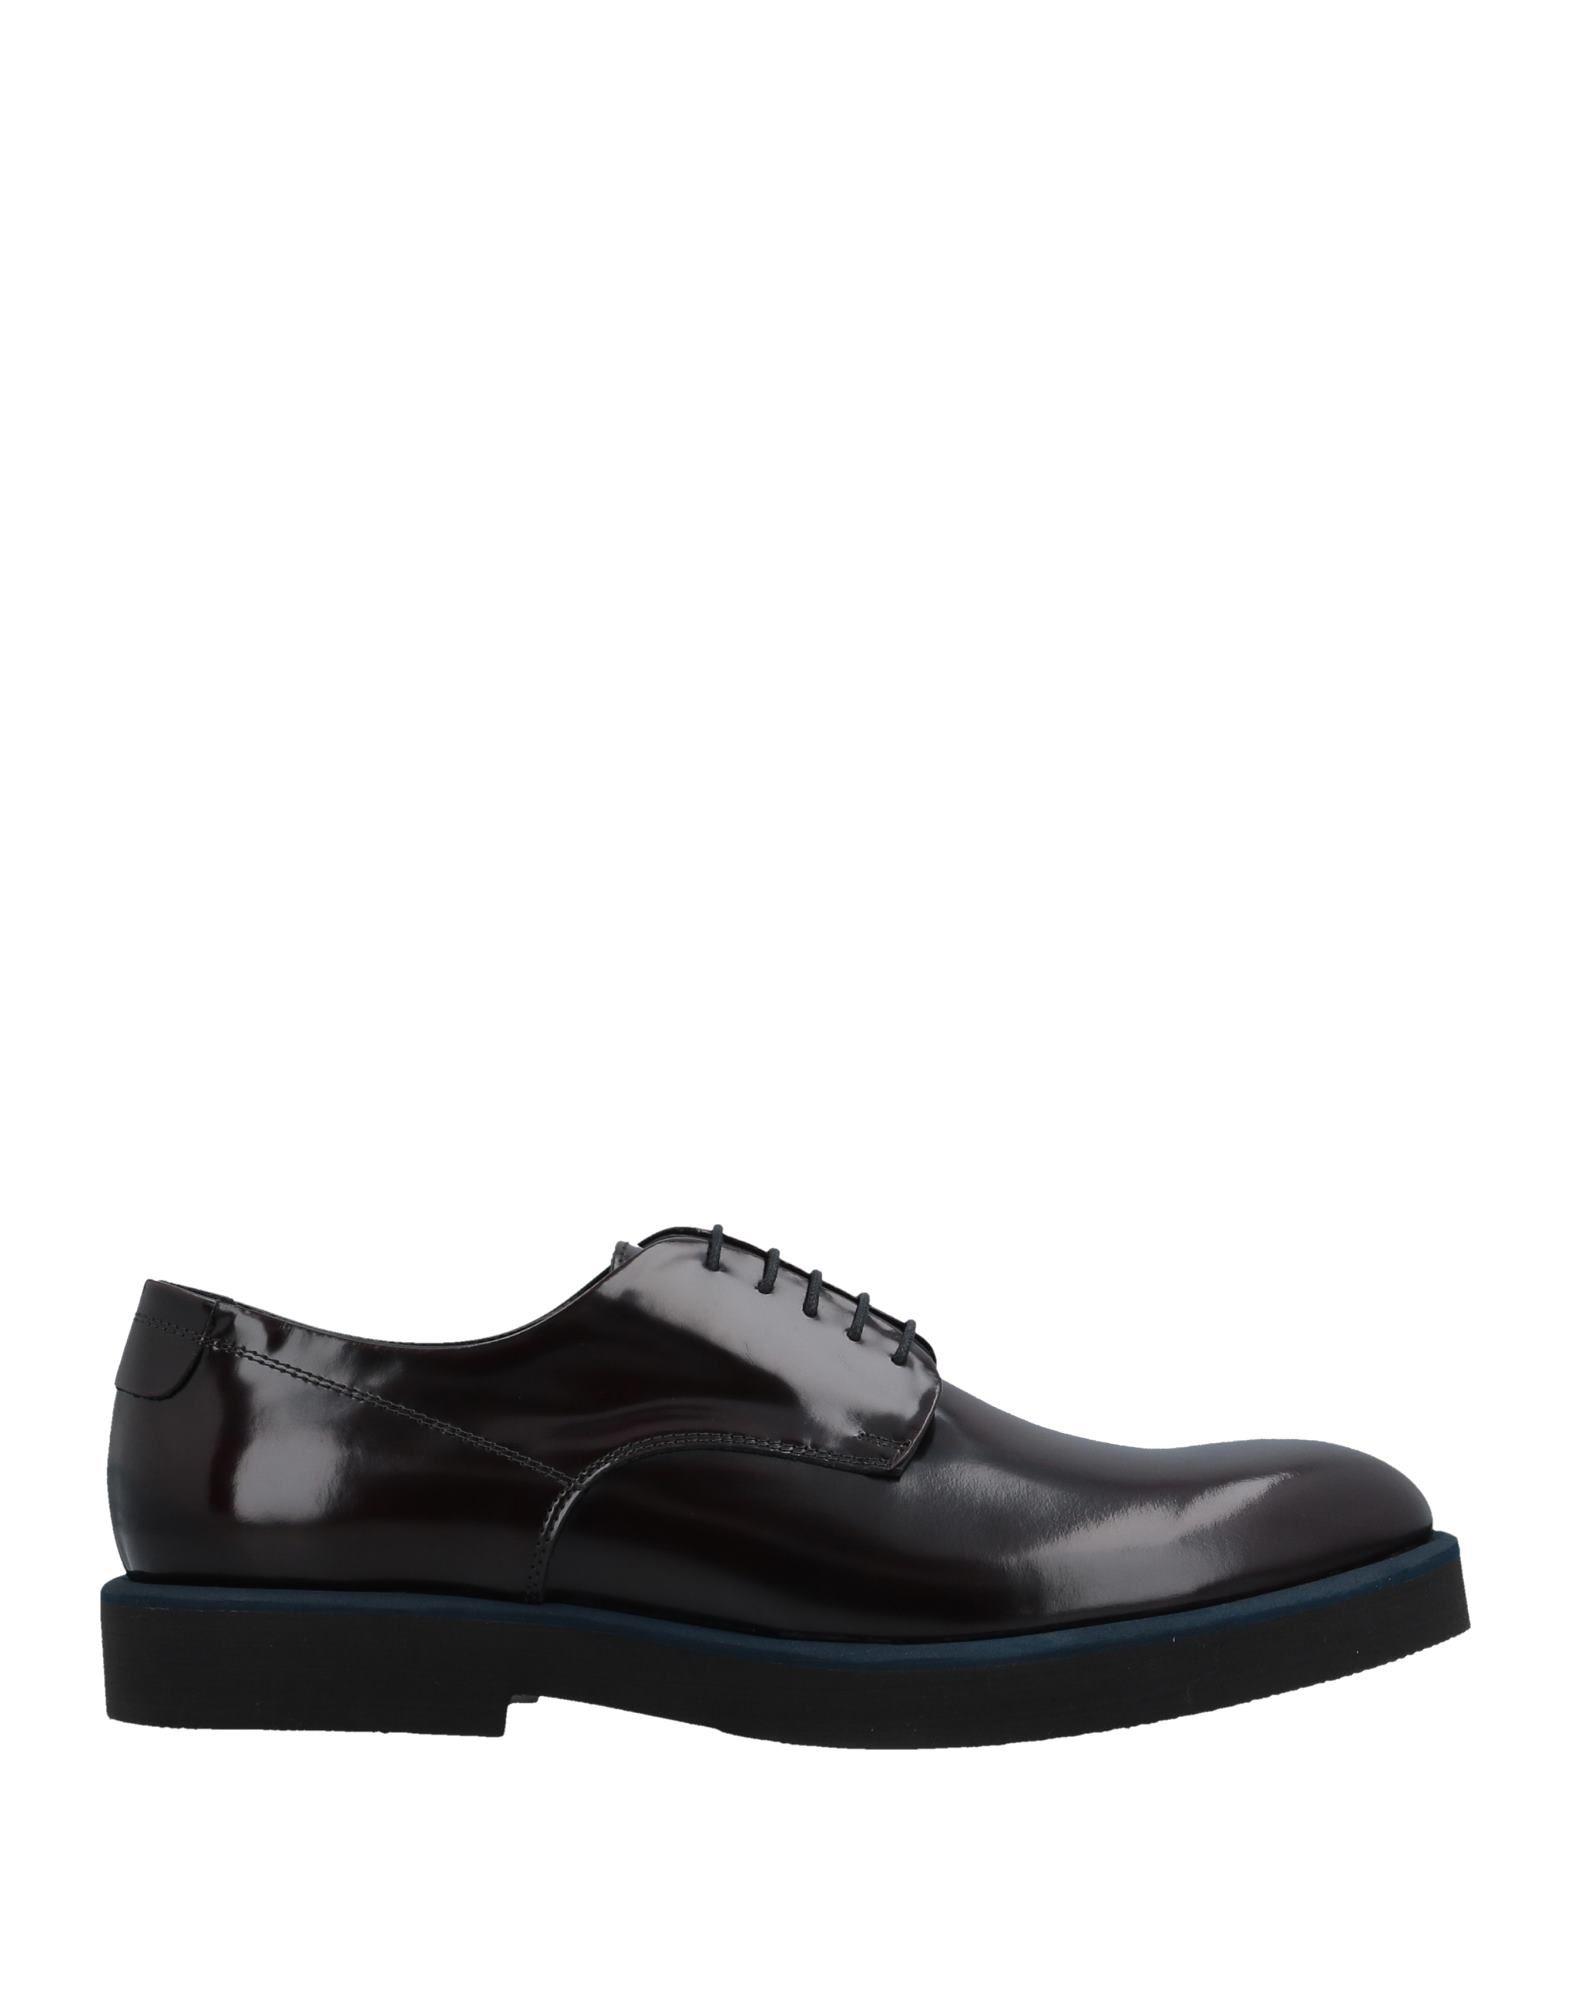 LORIBLU Обувь на шнурках первый внутри обувь обувь обувь обувь обувь обувь обувь обувь обувь 8a2549 мужская армия green 40 метров